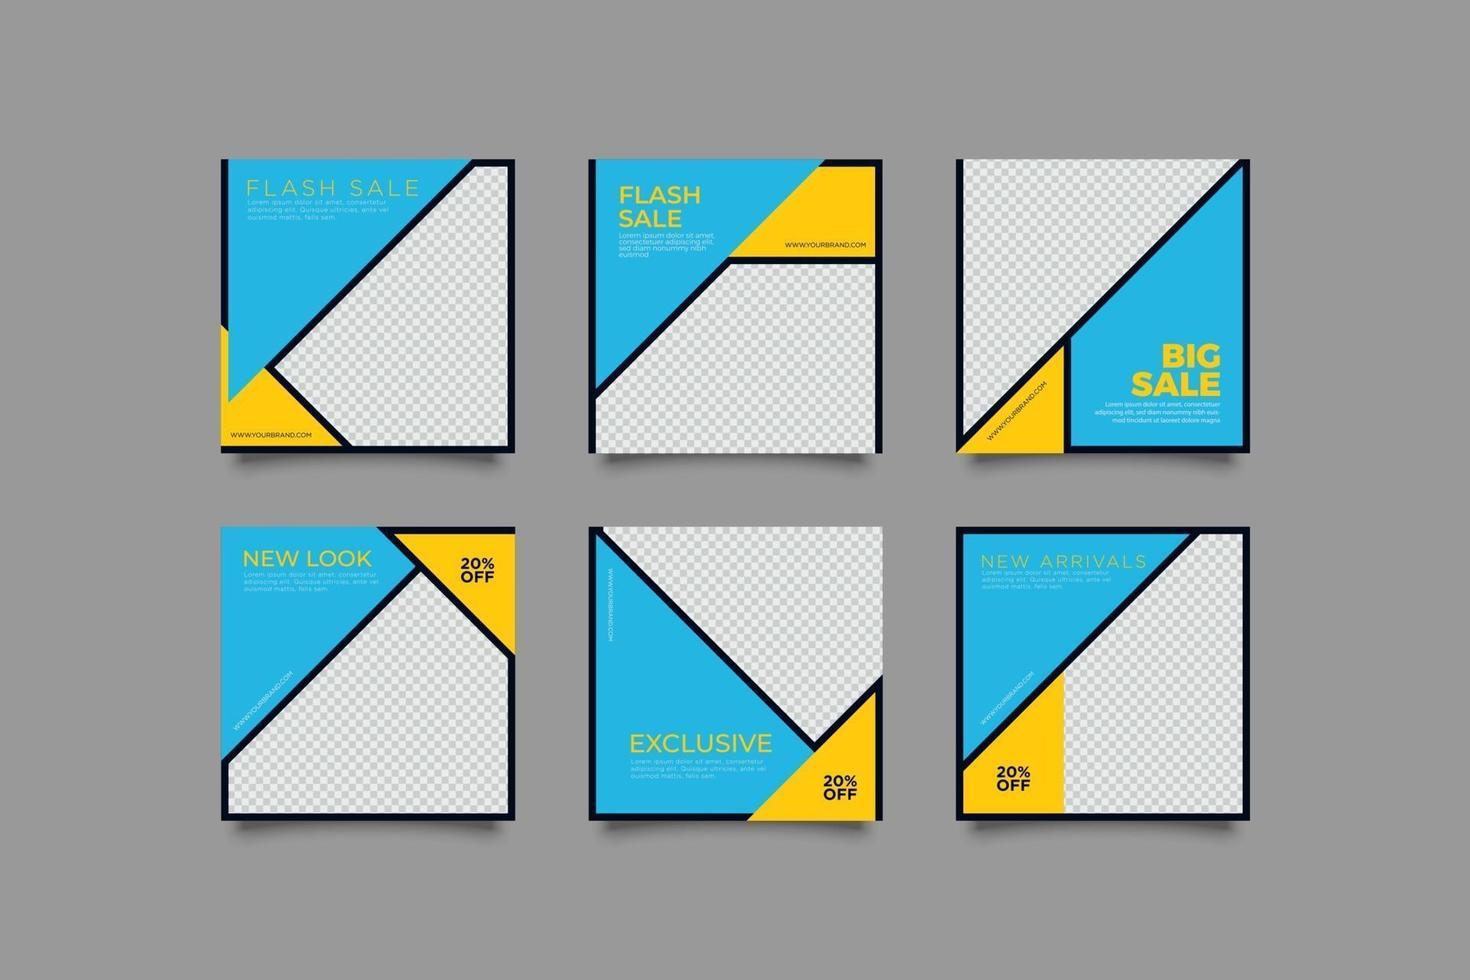 minimalistische moderne Social-Media-Beiträge vektor